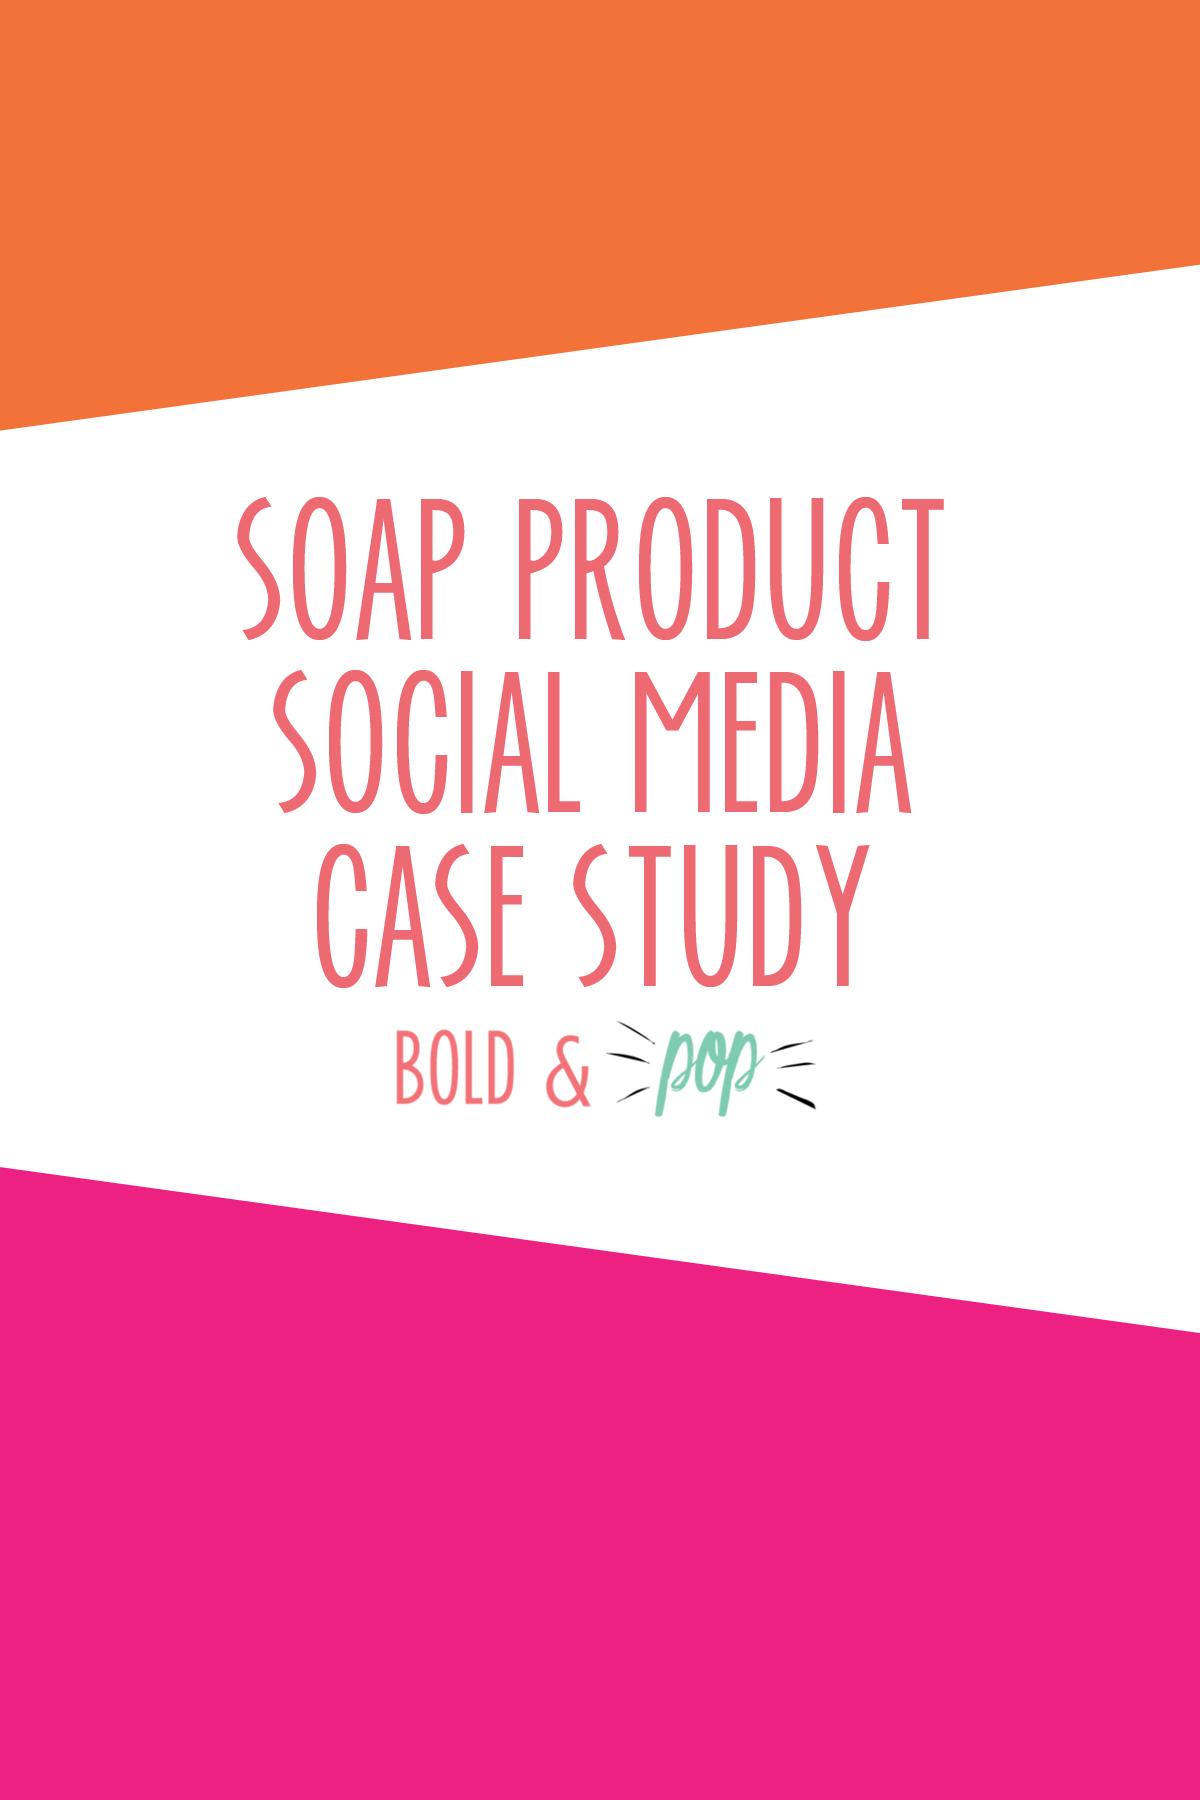 Bold & Pop : Soap Product Social Media Case Study